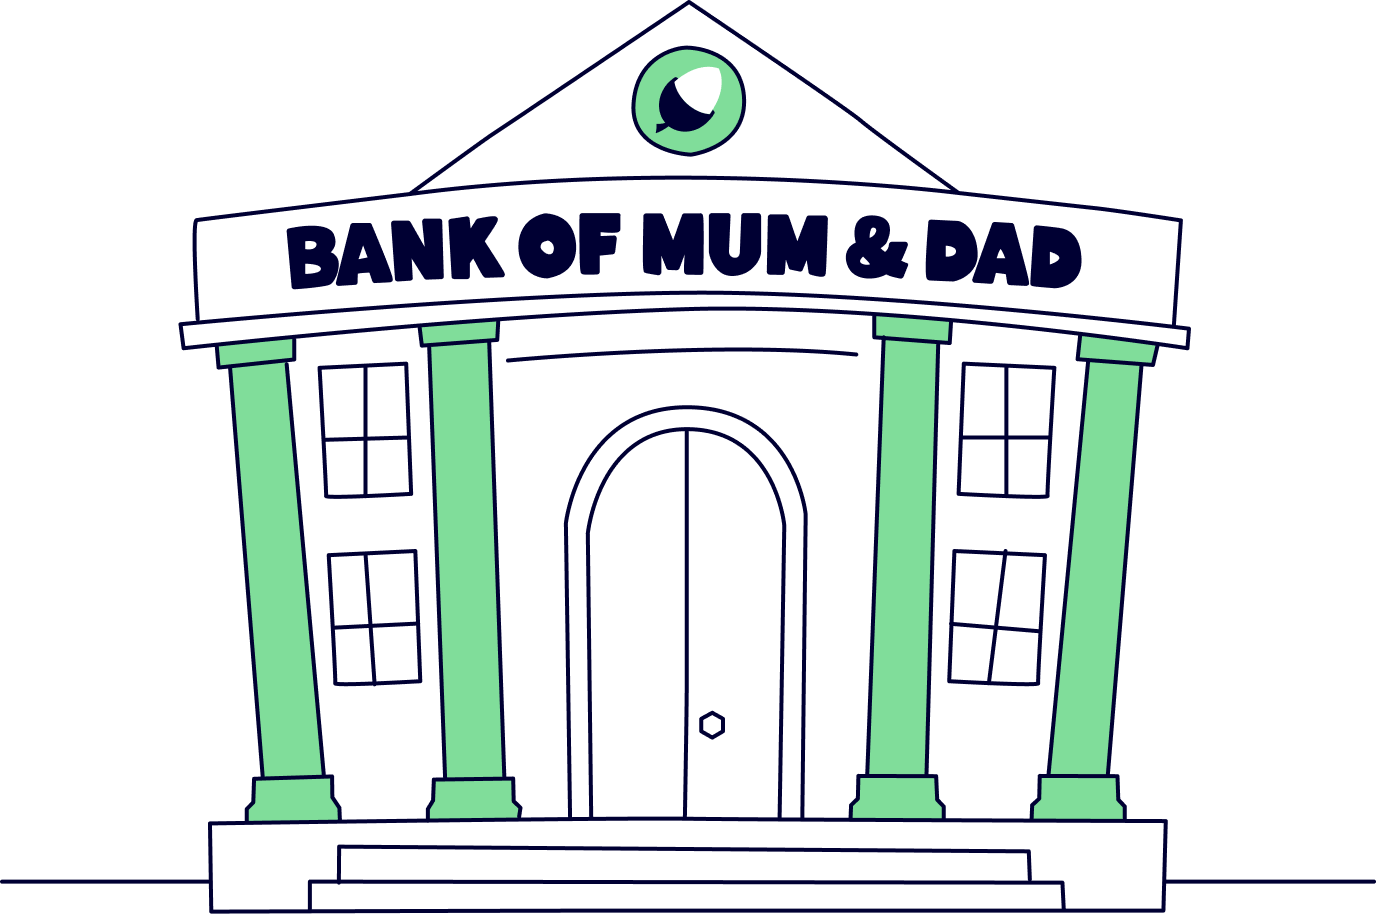 Bank of mum and dad